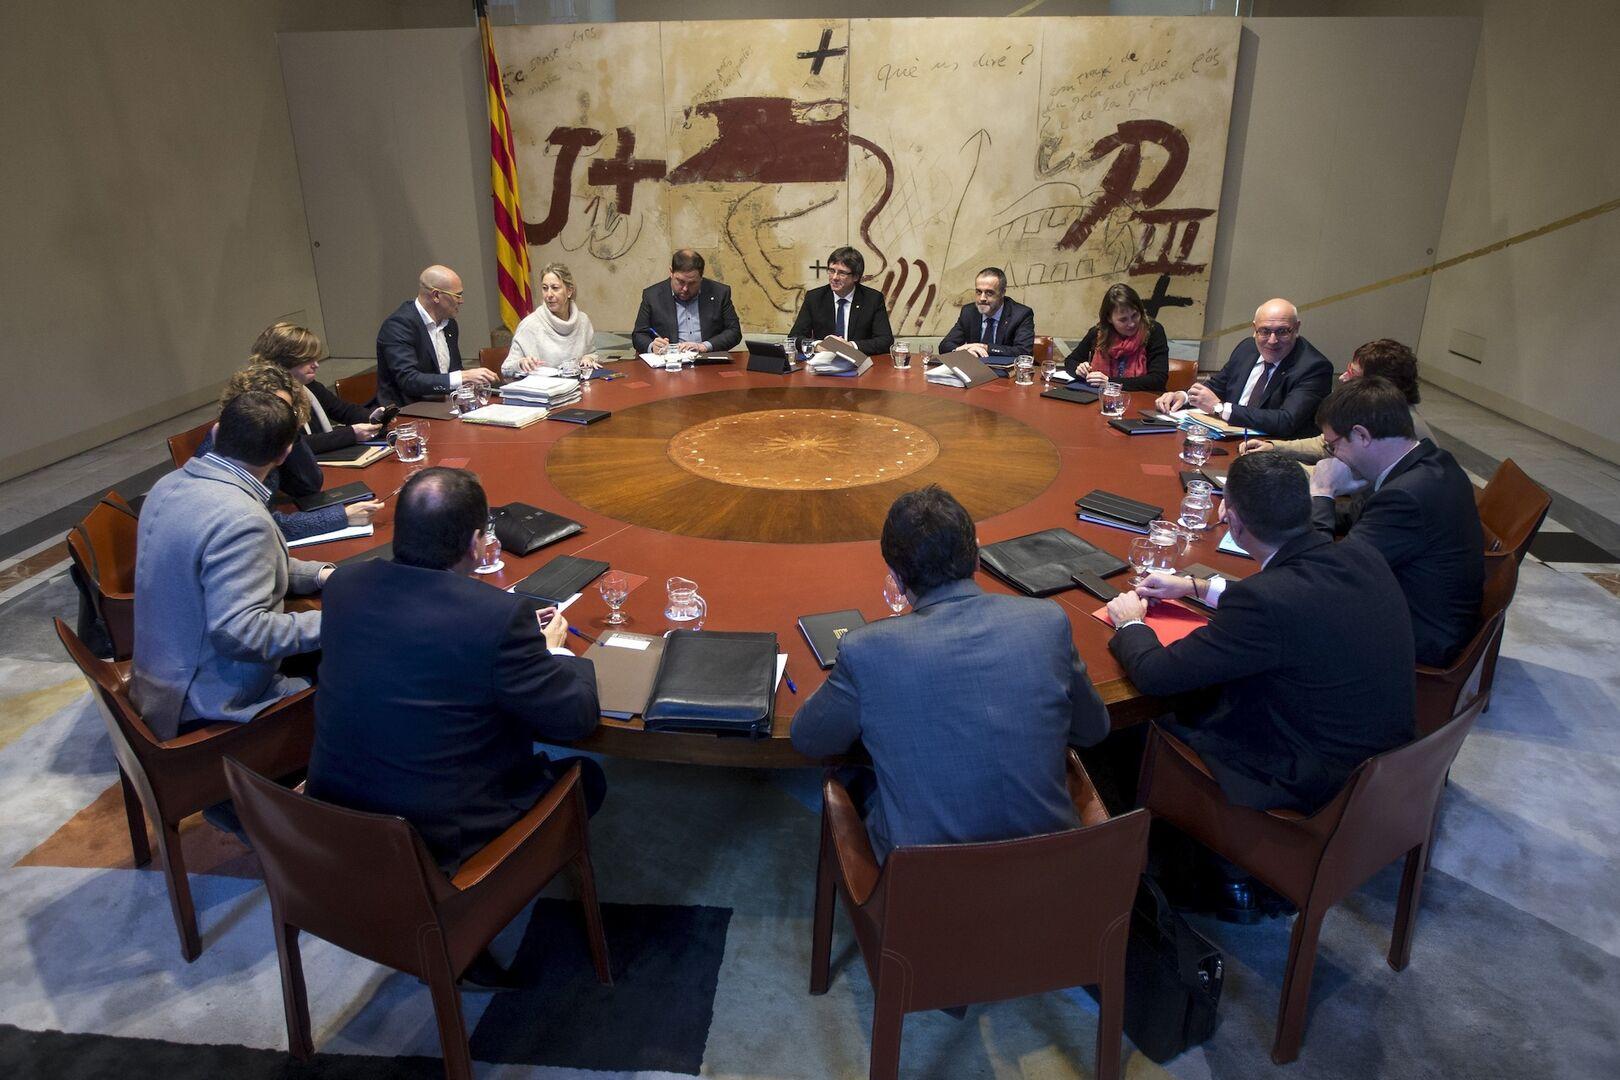 Cataluña, en la fase definitiva: intervención o referéndum